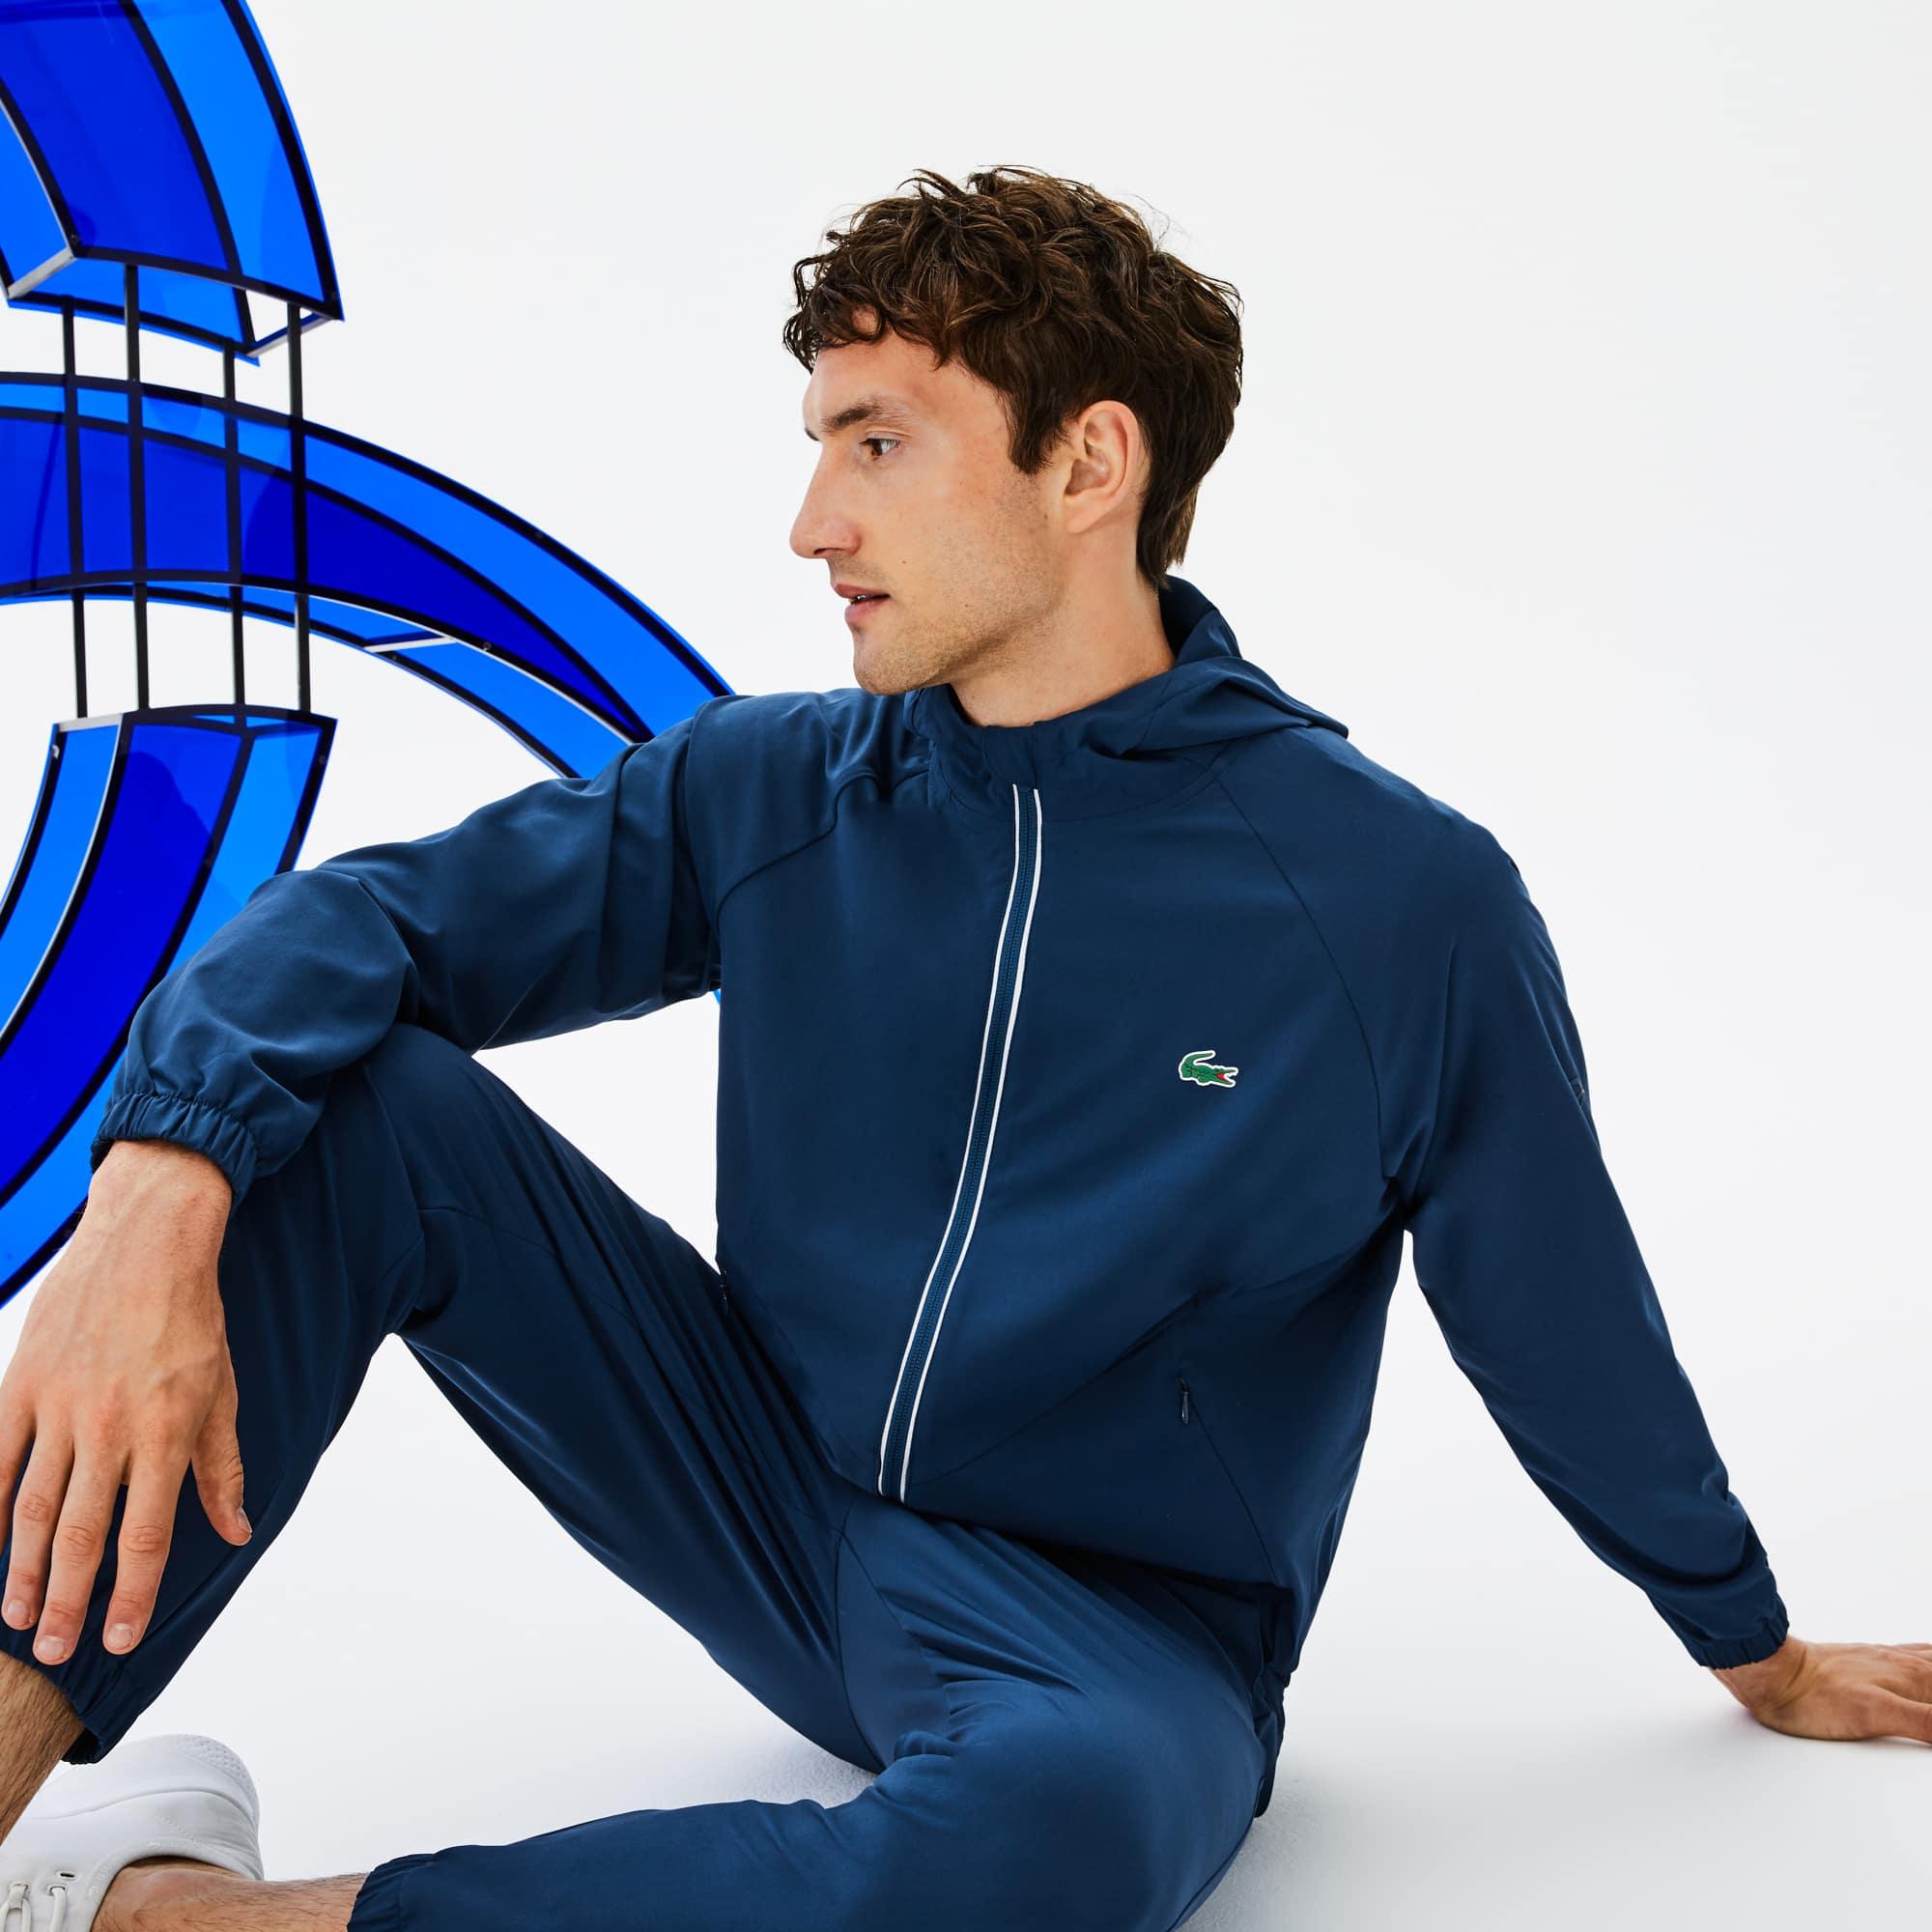 Chaqueta De Hombre Lacoste SPORT Novak Djokovic-Off Court Premium Collection En Tejido Técnico De Capa Intermedia Con Capucha